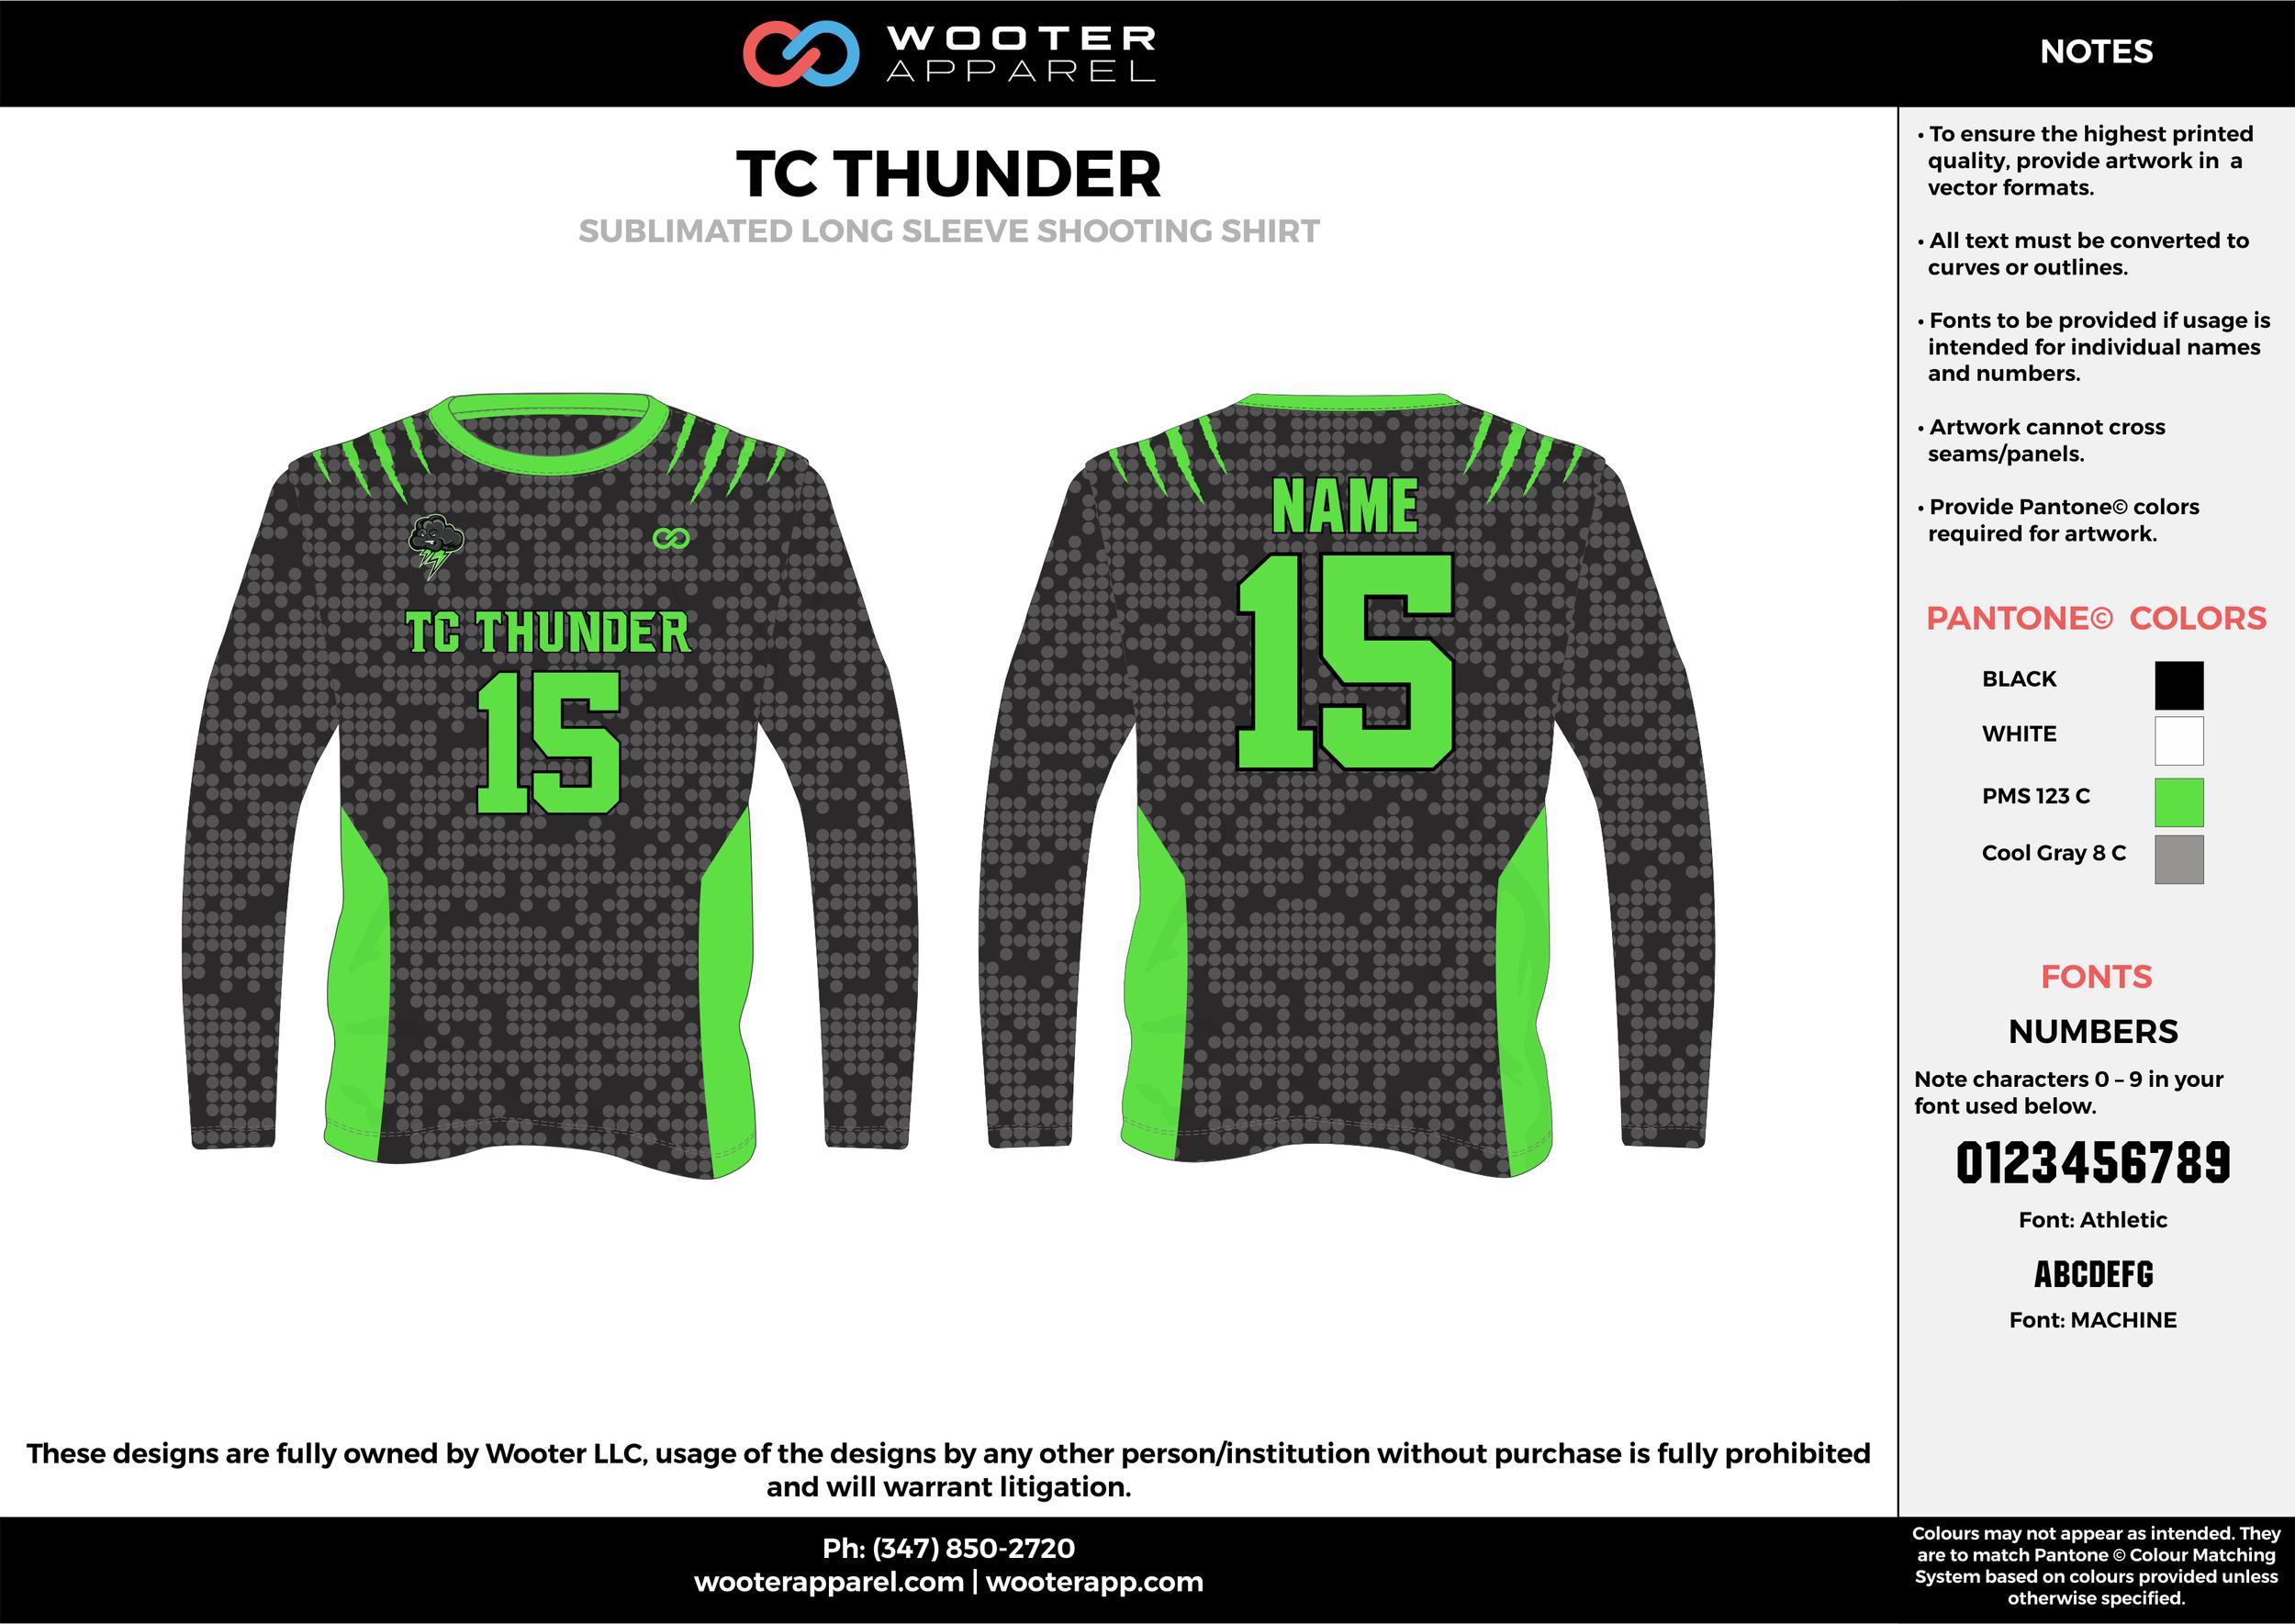 TC THUNDER black green gray custom design t-shirts